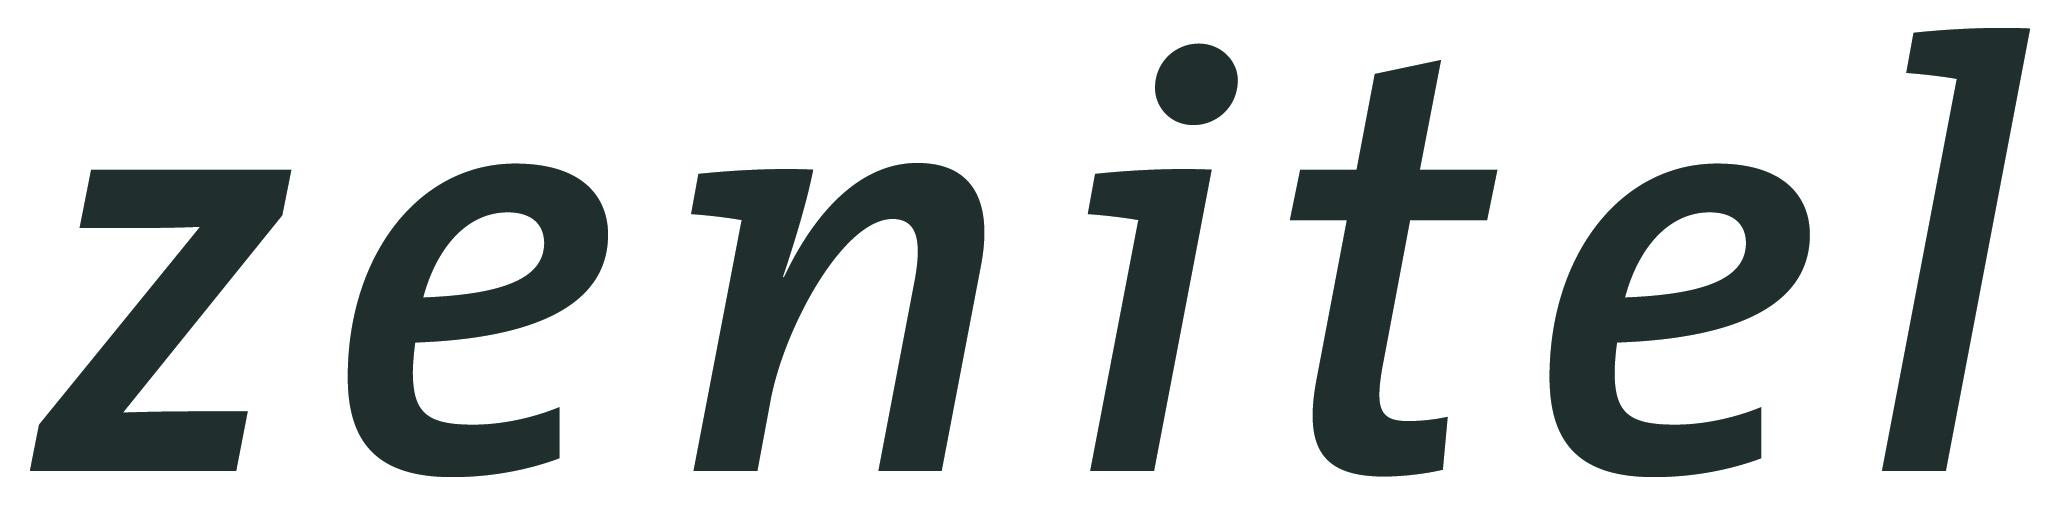 RS2 Tech. Offers Intelligent Communications by Zenitel